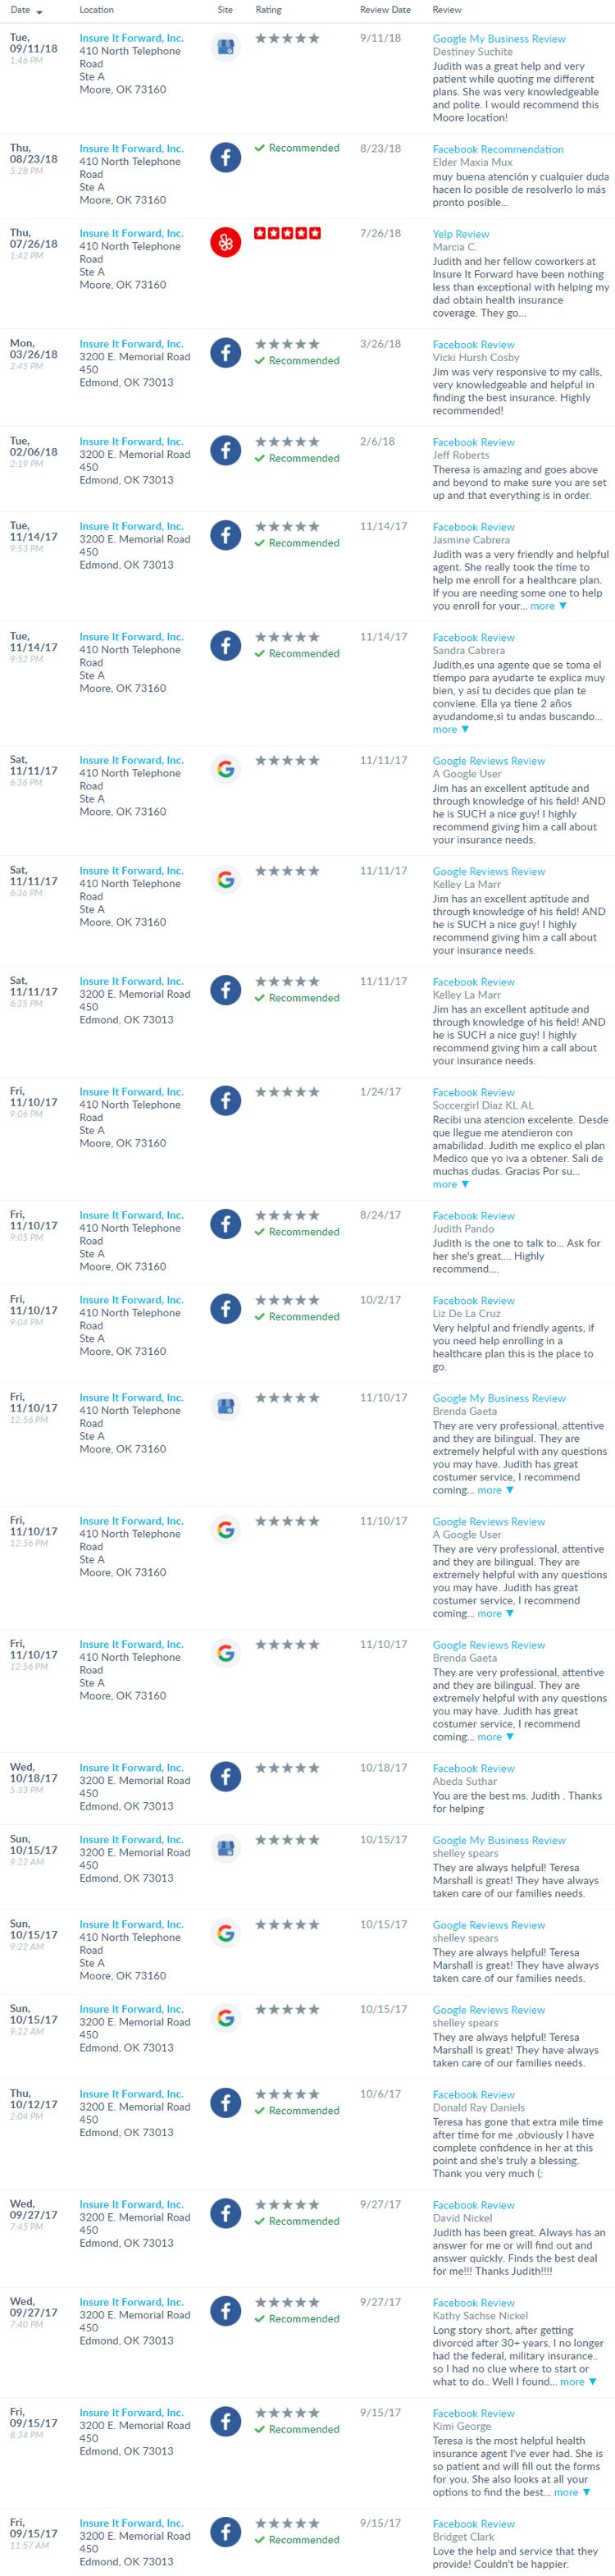 insure it forward social media reviews